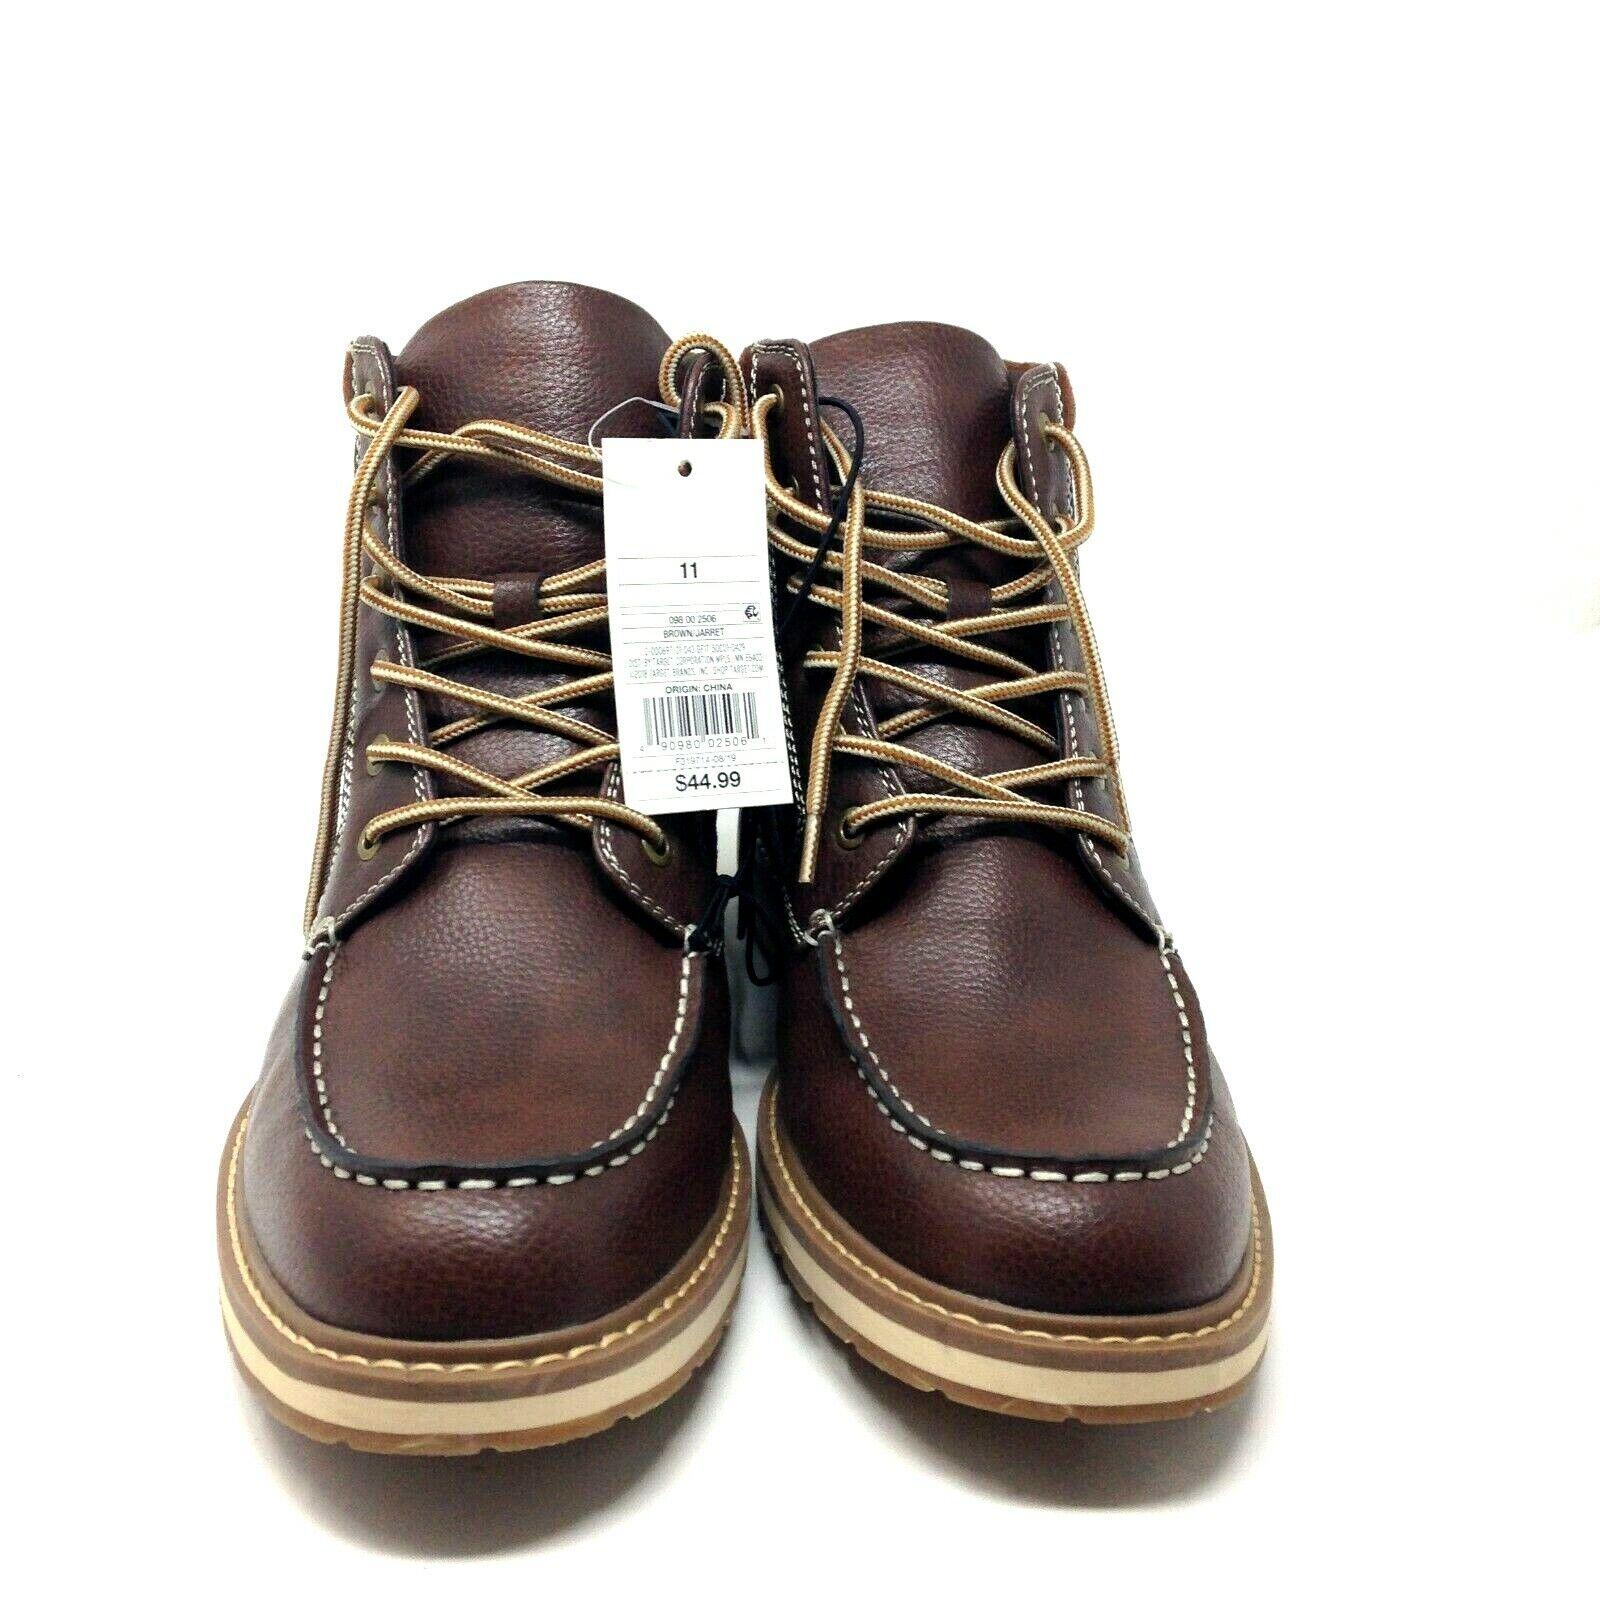 Goodfellow & Co Men's Jarret Fashion Boots Brown 11.5